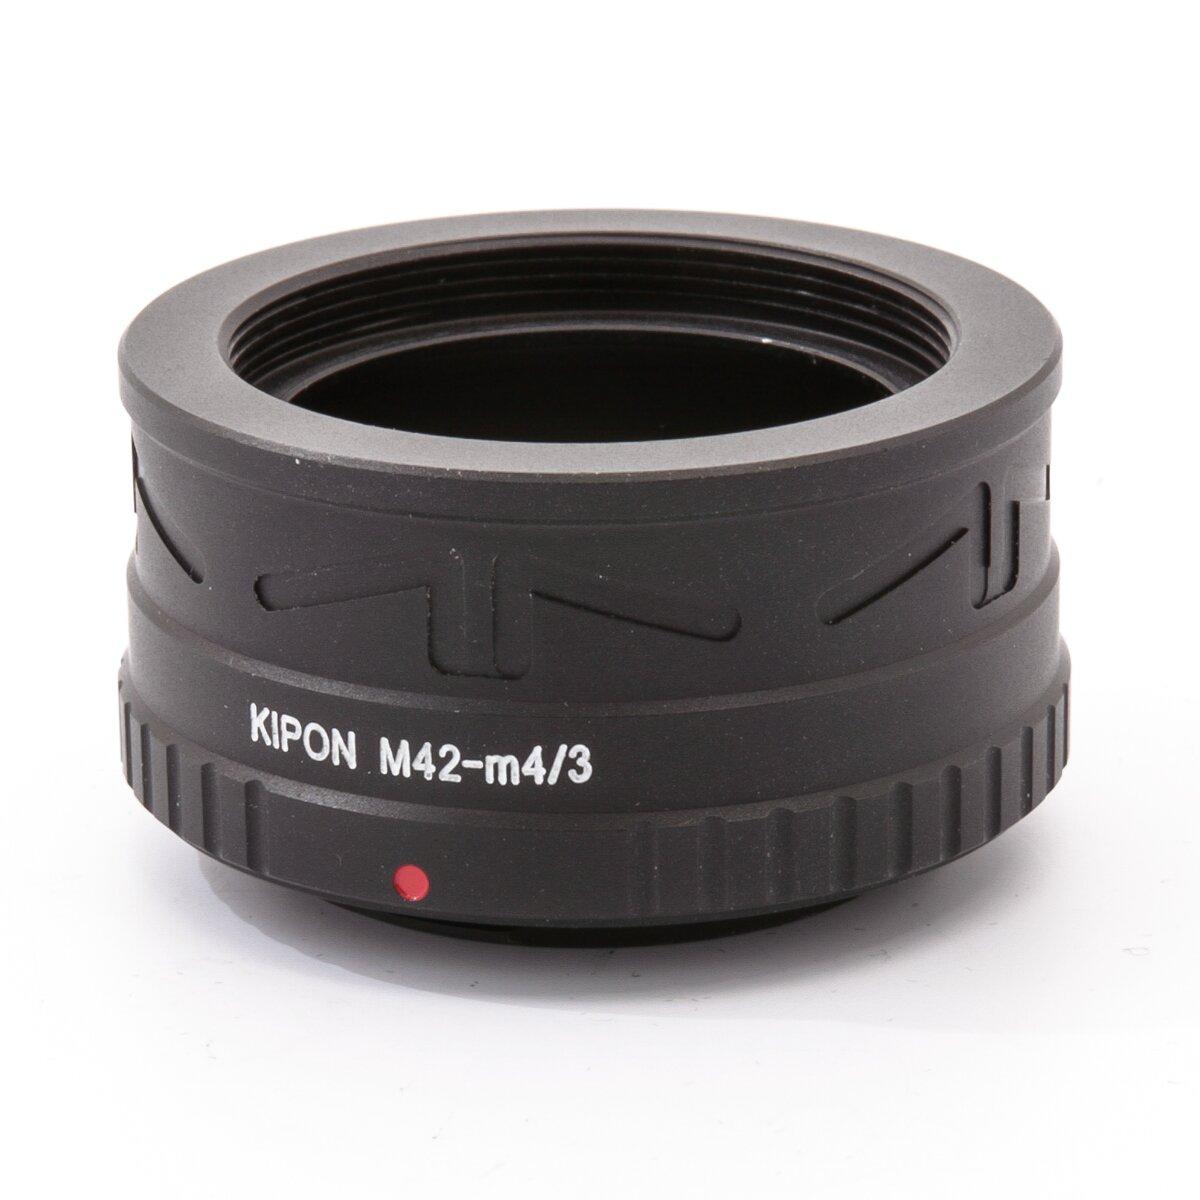 Adapter M42 Objektive an Micro Fourthirds Gehäuse